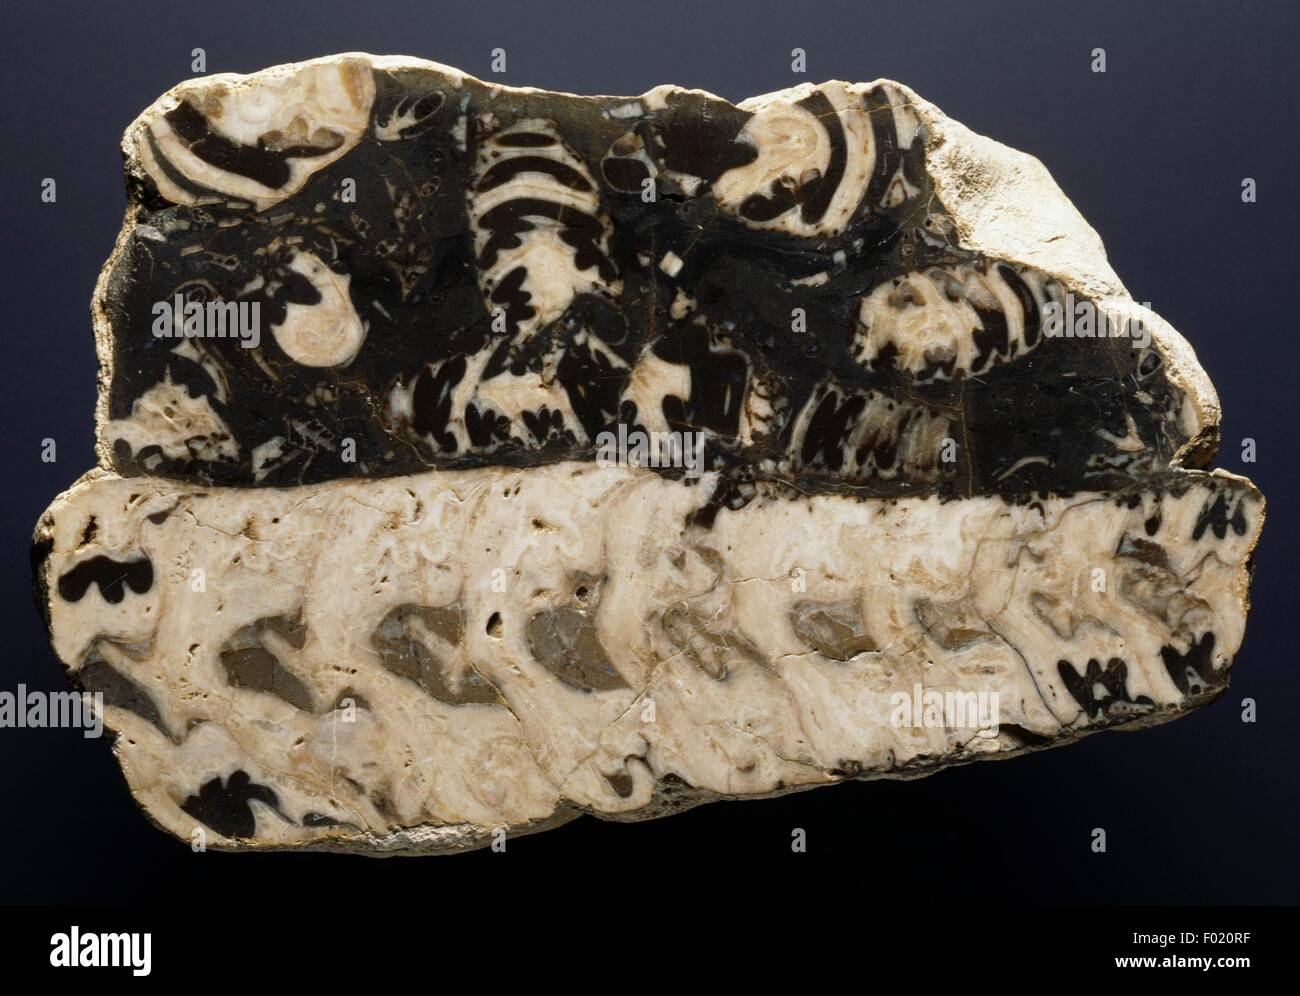 Fossil Limestone, Cretaceous. - Stock Image